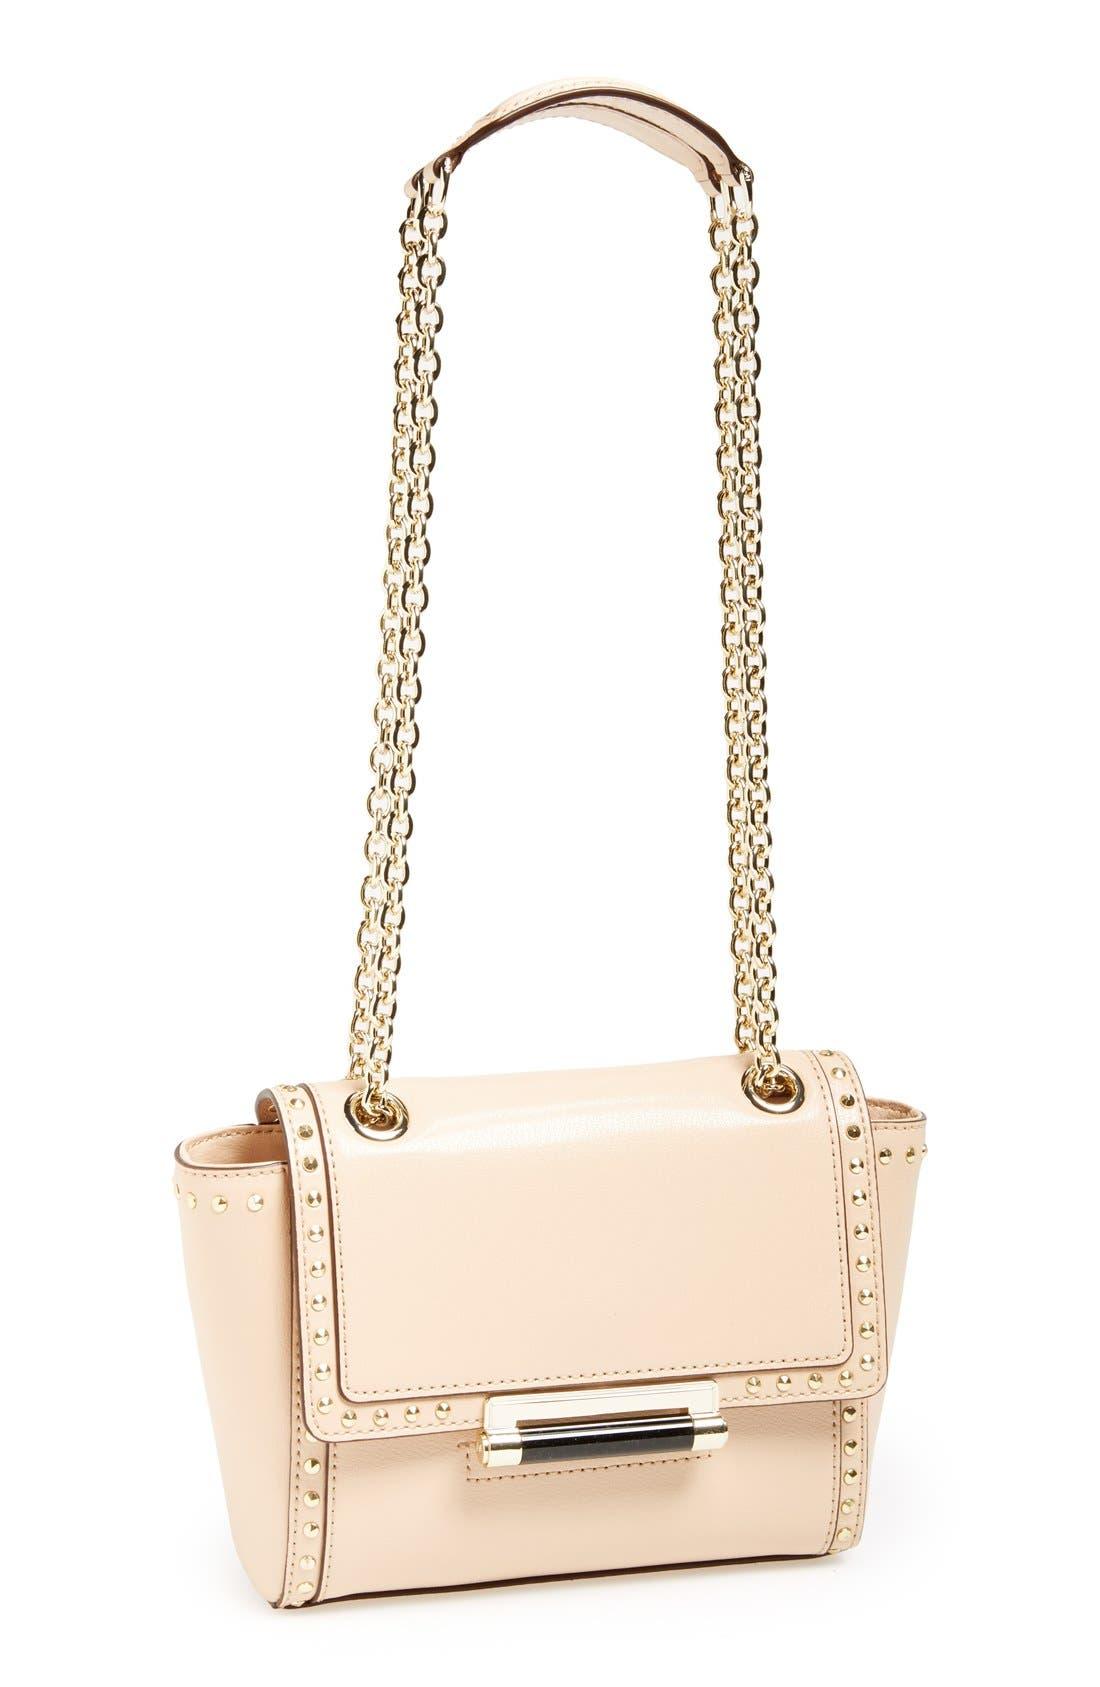 Alternate Image 1 Selected - Diane von Furstenberg 'Mini 440' Stud Leather Crossbody Bag